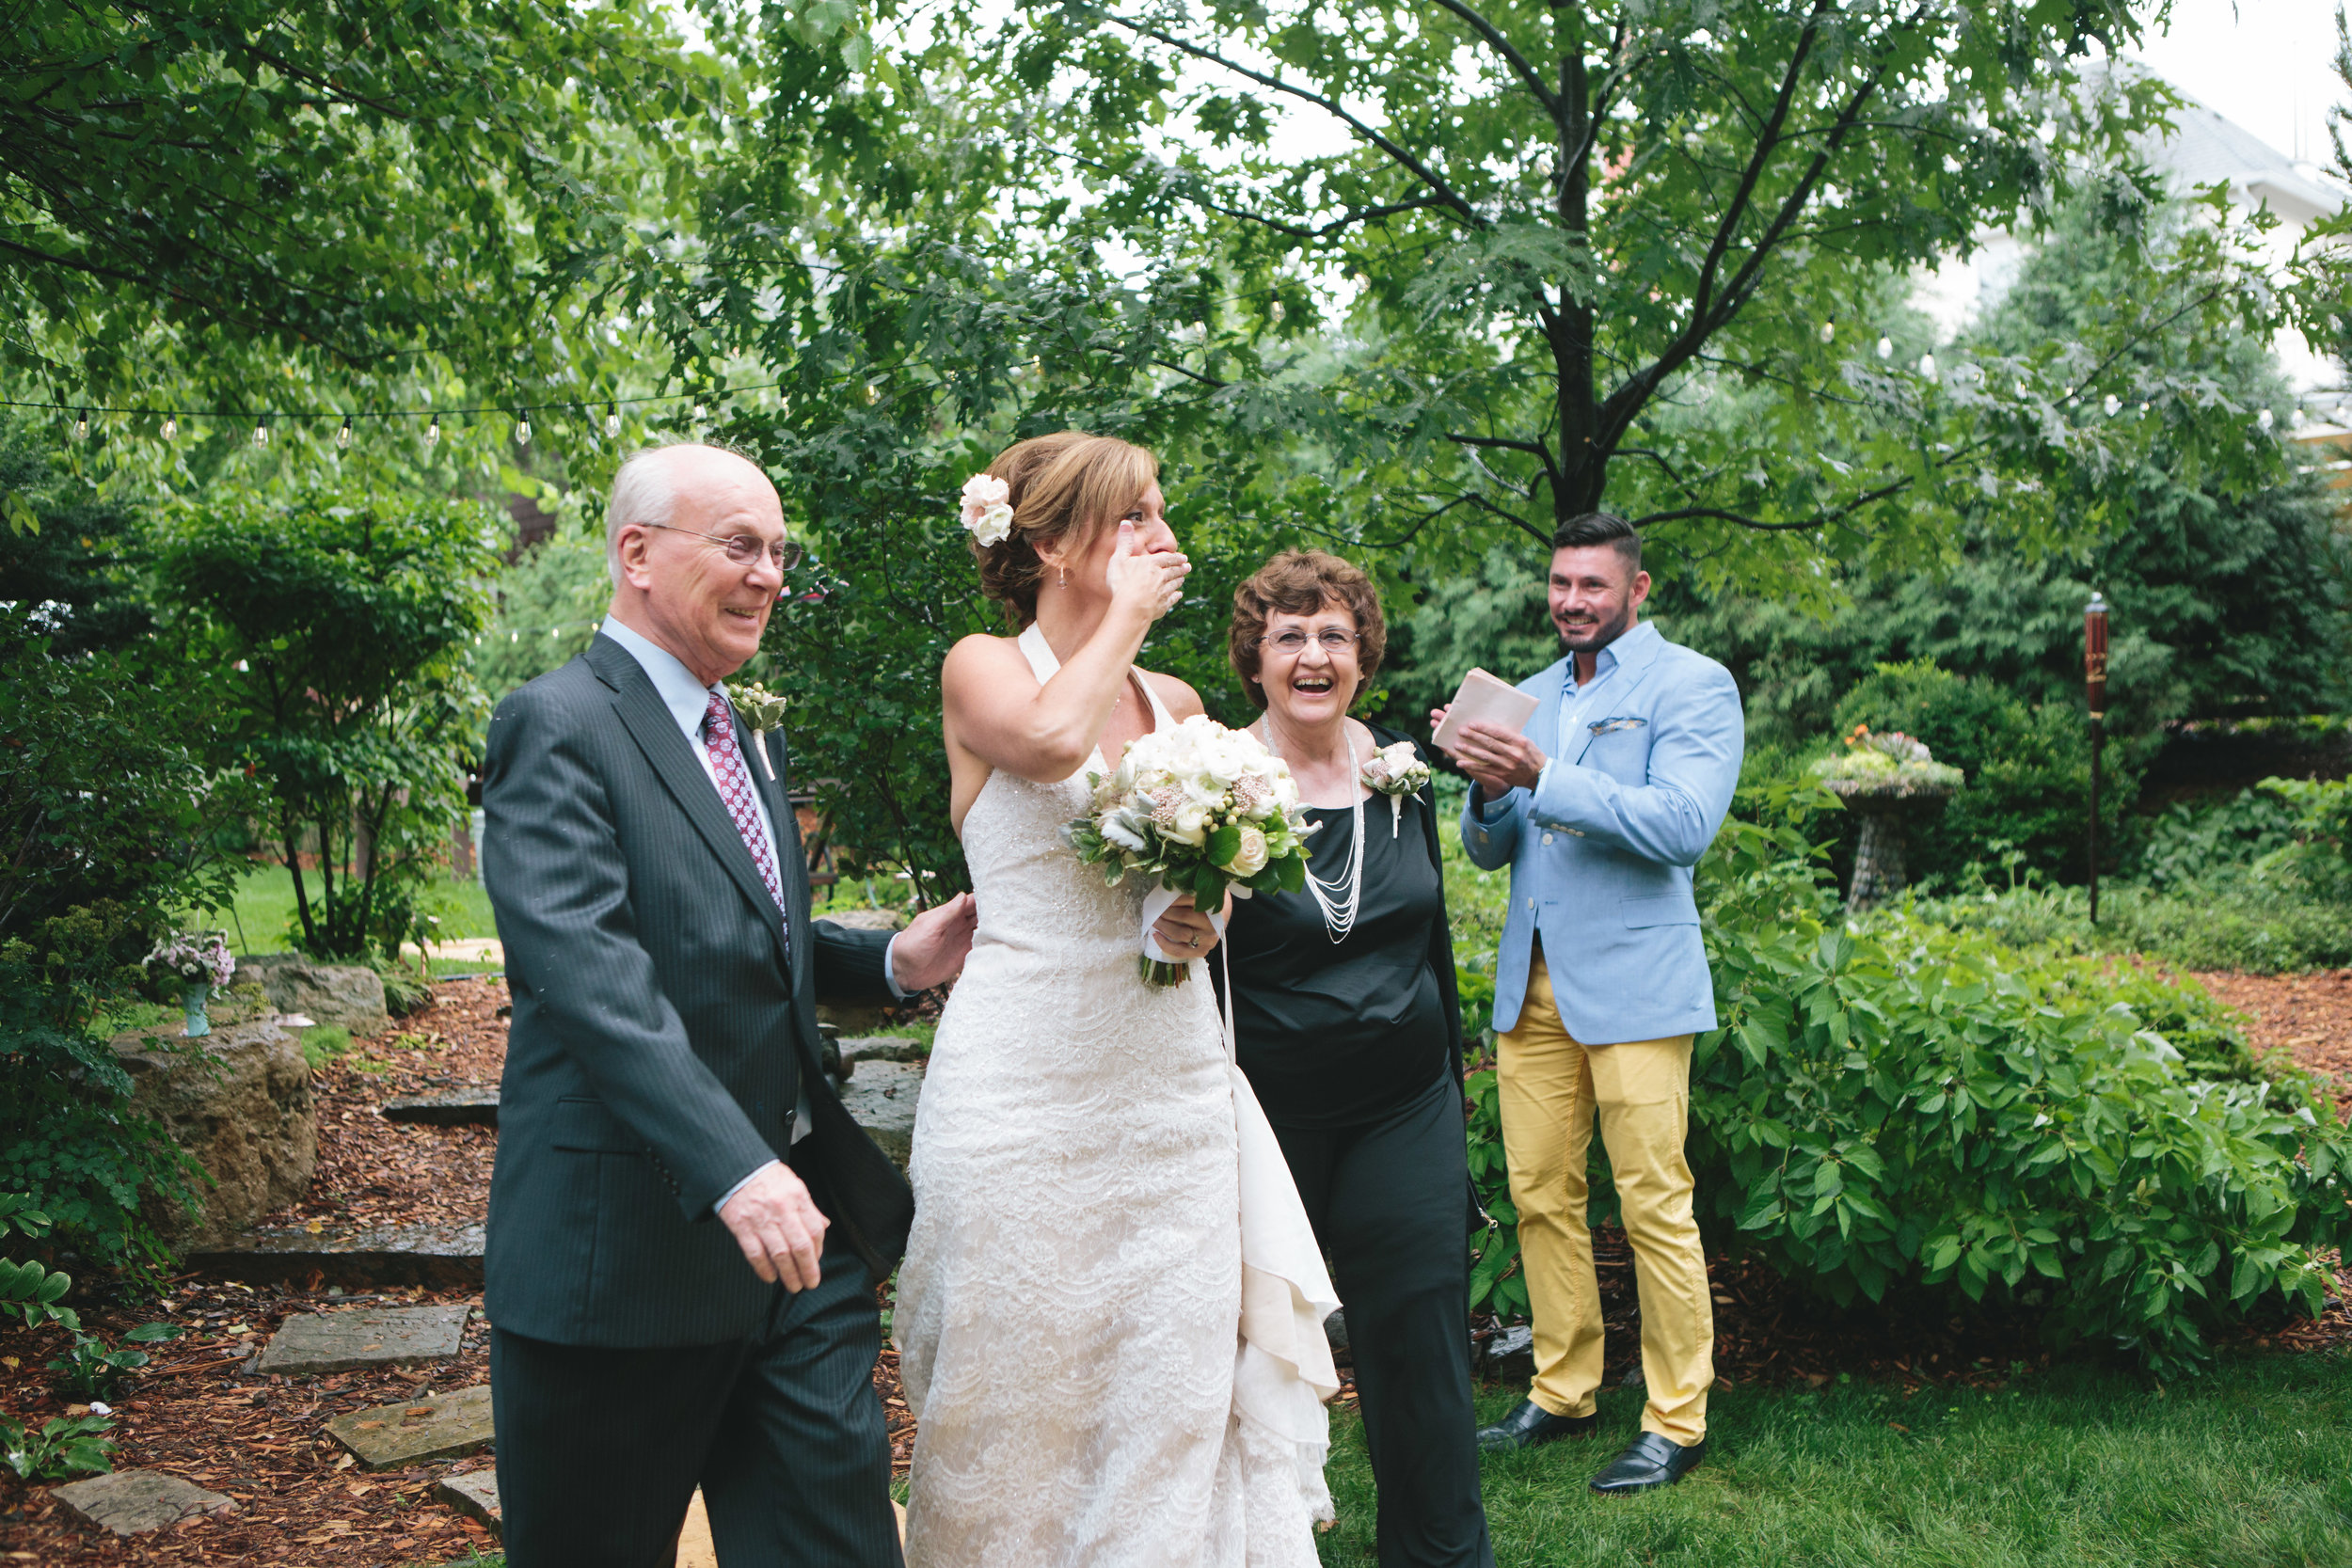 prepare for rain on wedding day, lace wedding dress, backyard wedding inspiration, candid wedding photos